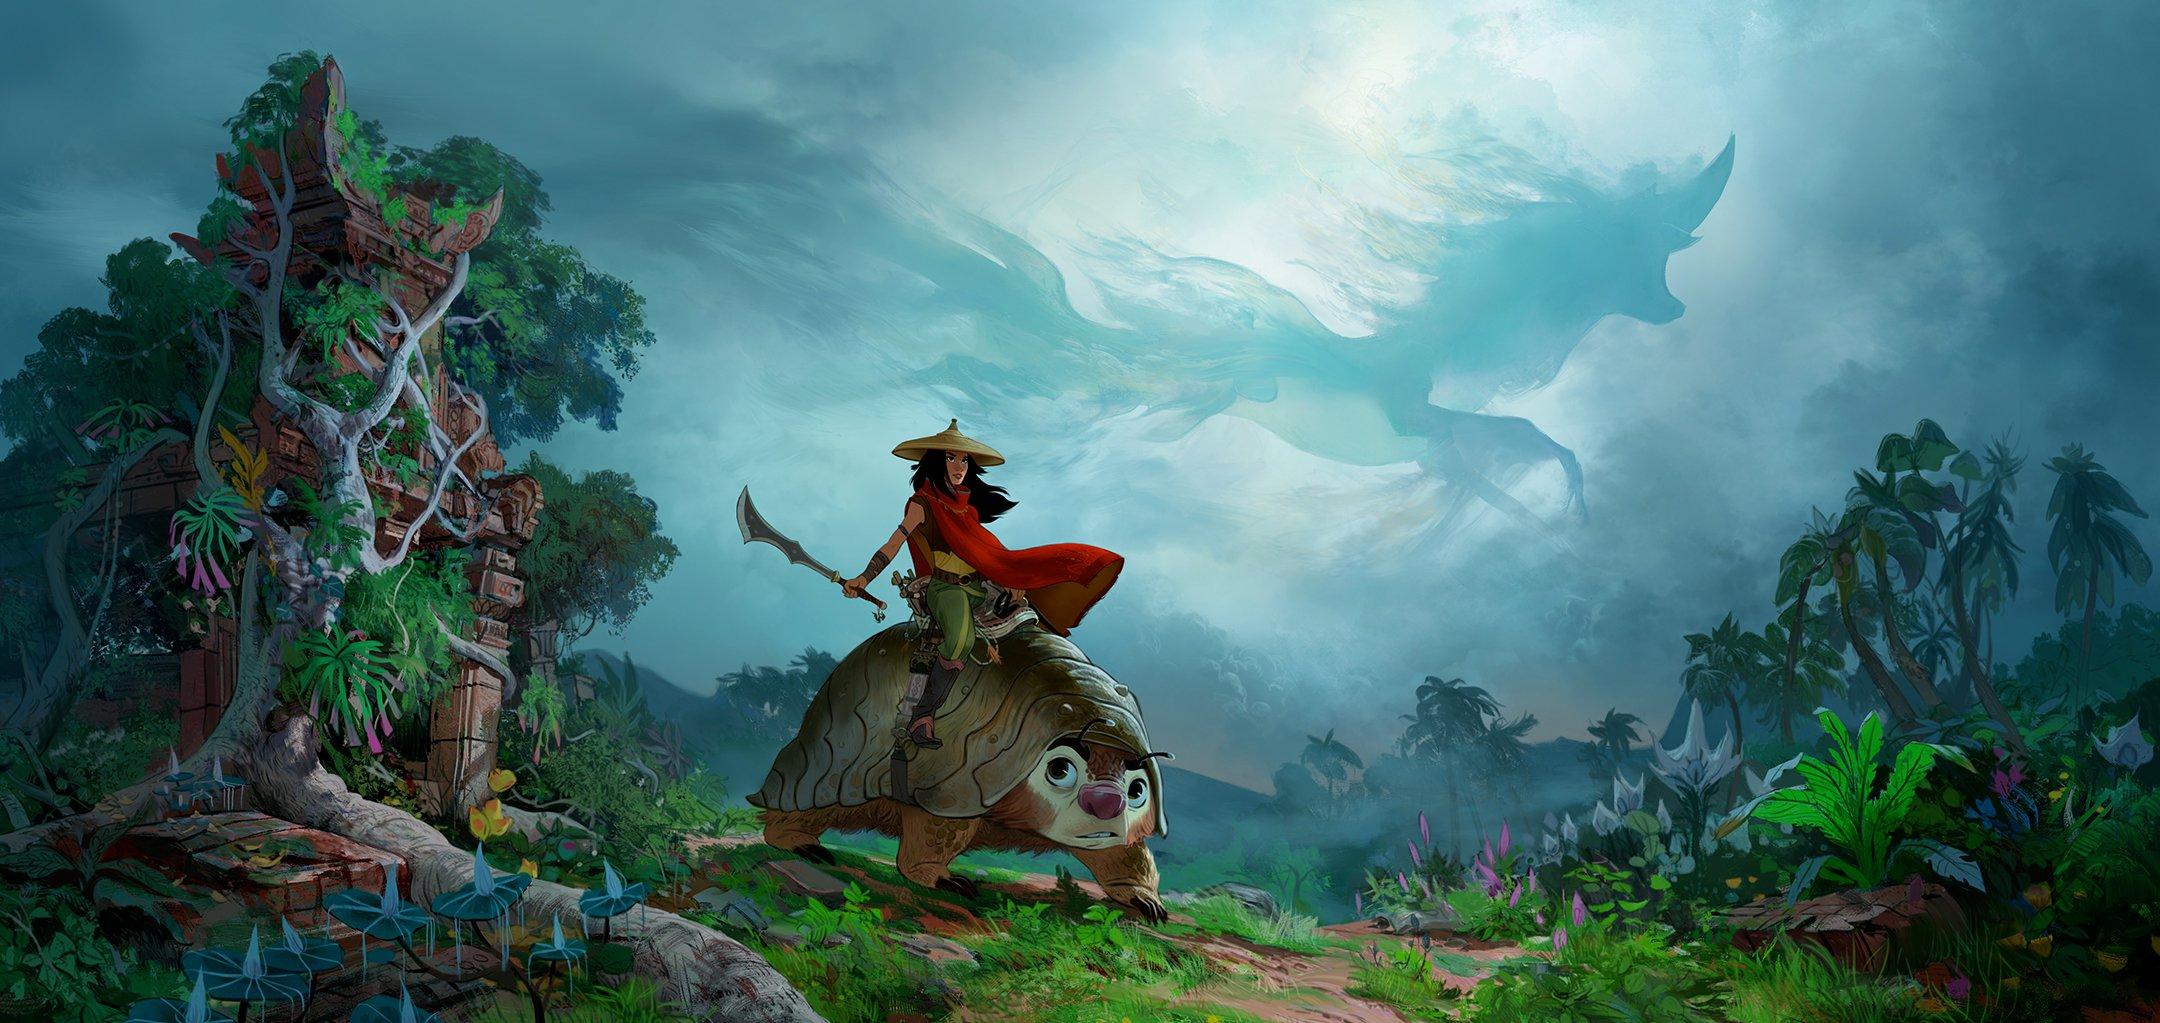 Raya and the Last Dragon, 2021, Paul Felix, concept art, digital painting © Disney Enterprises